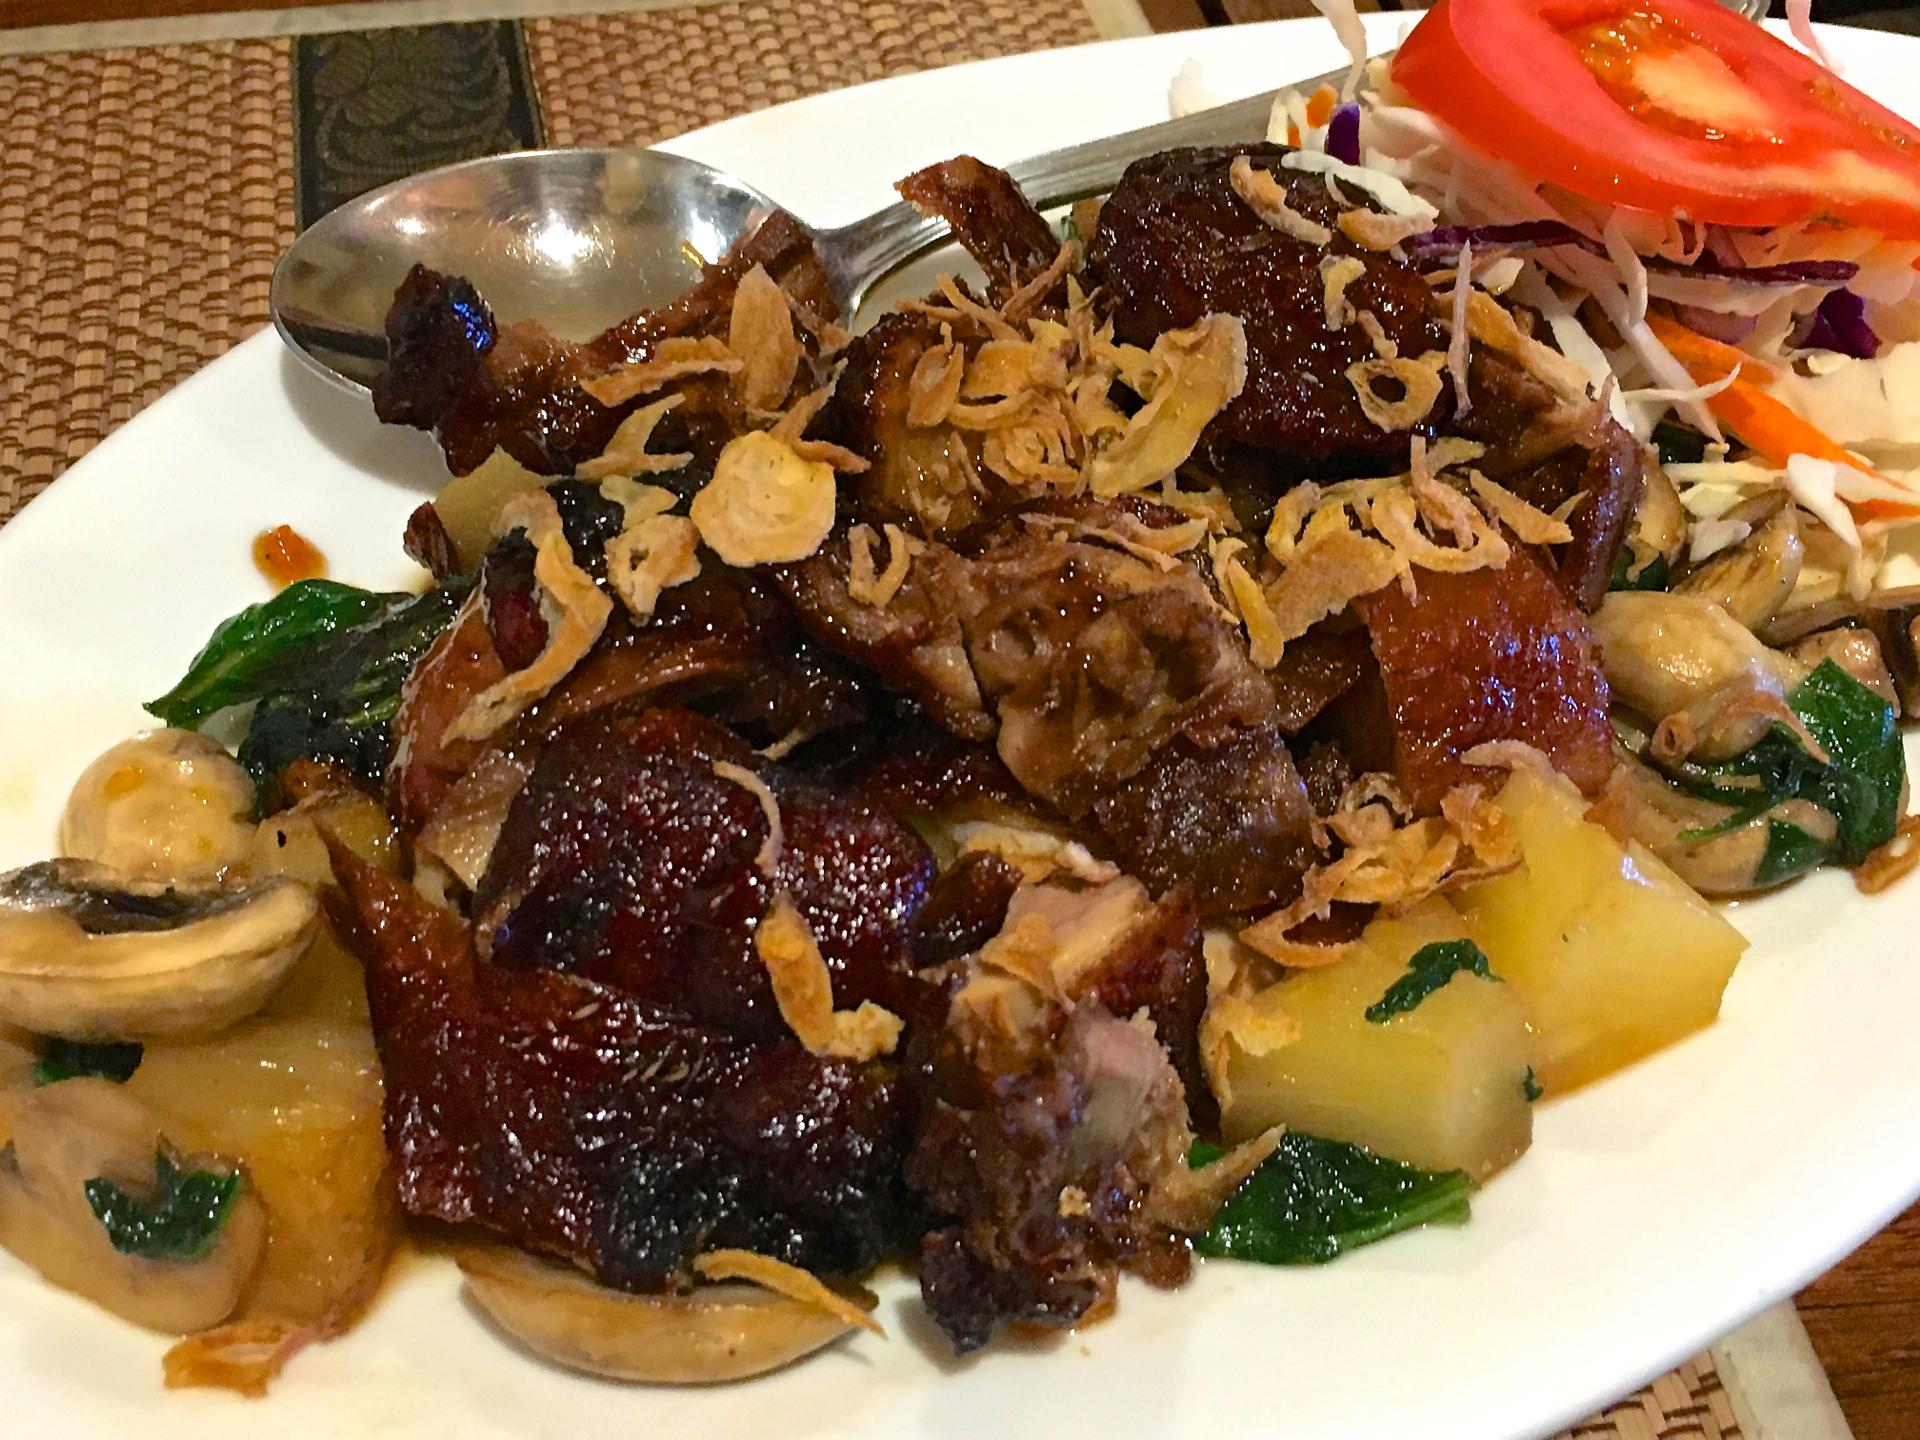 The Tamarind Glazed Duck at Tee Nee Thai Cuisine.